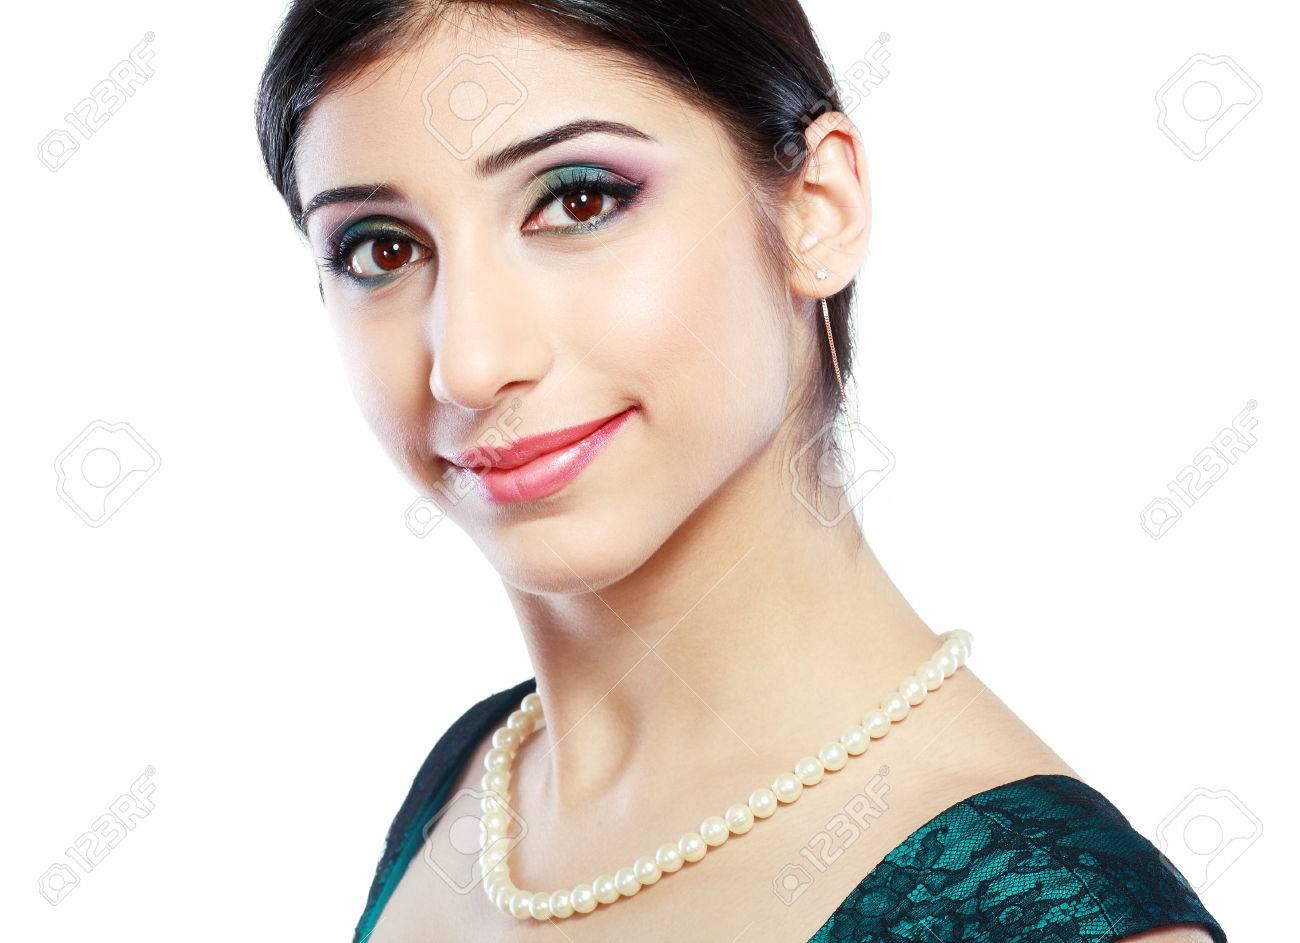 Moyen-Orient teen sexe gratuit filles nues galeries